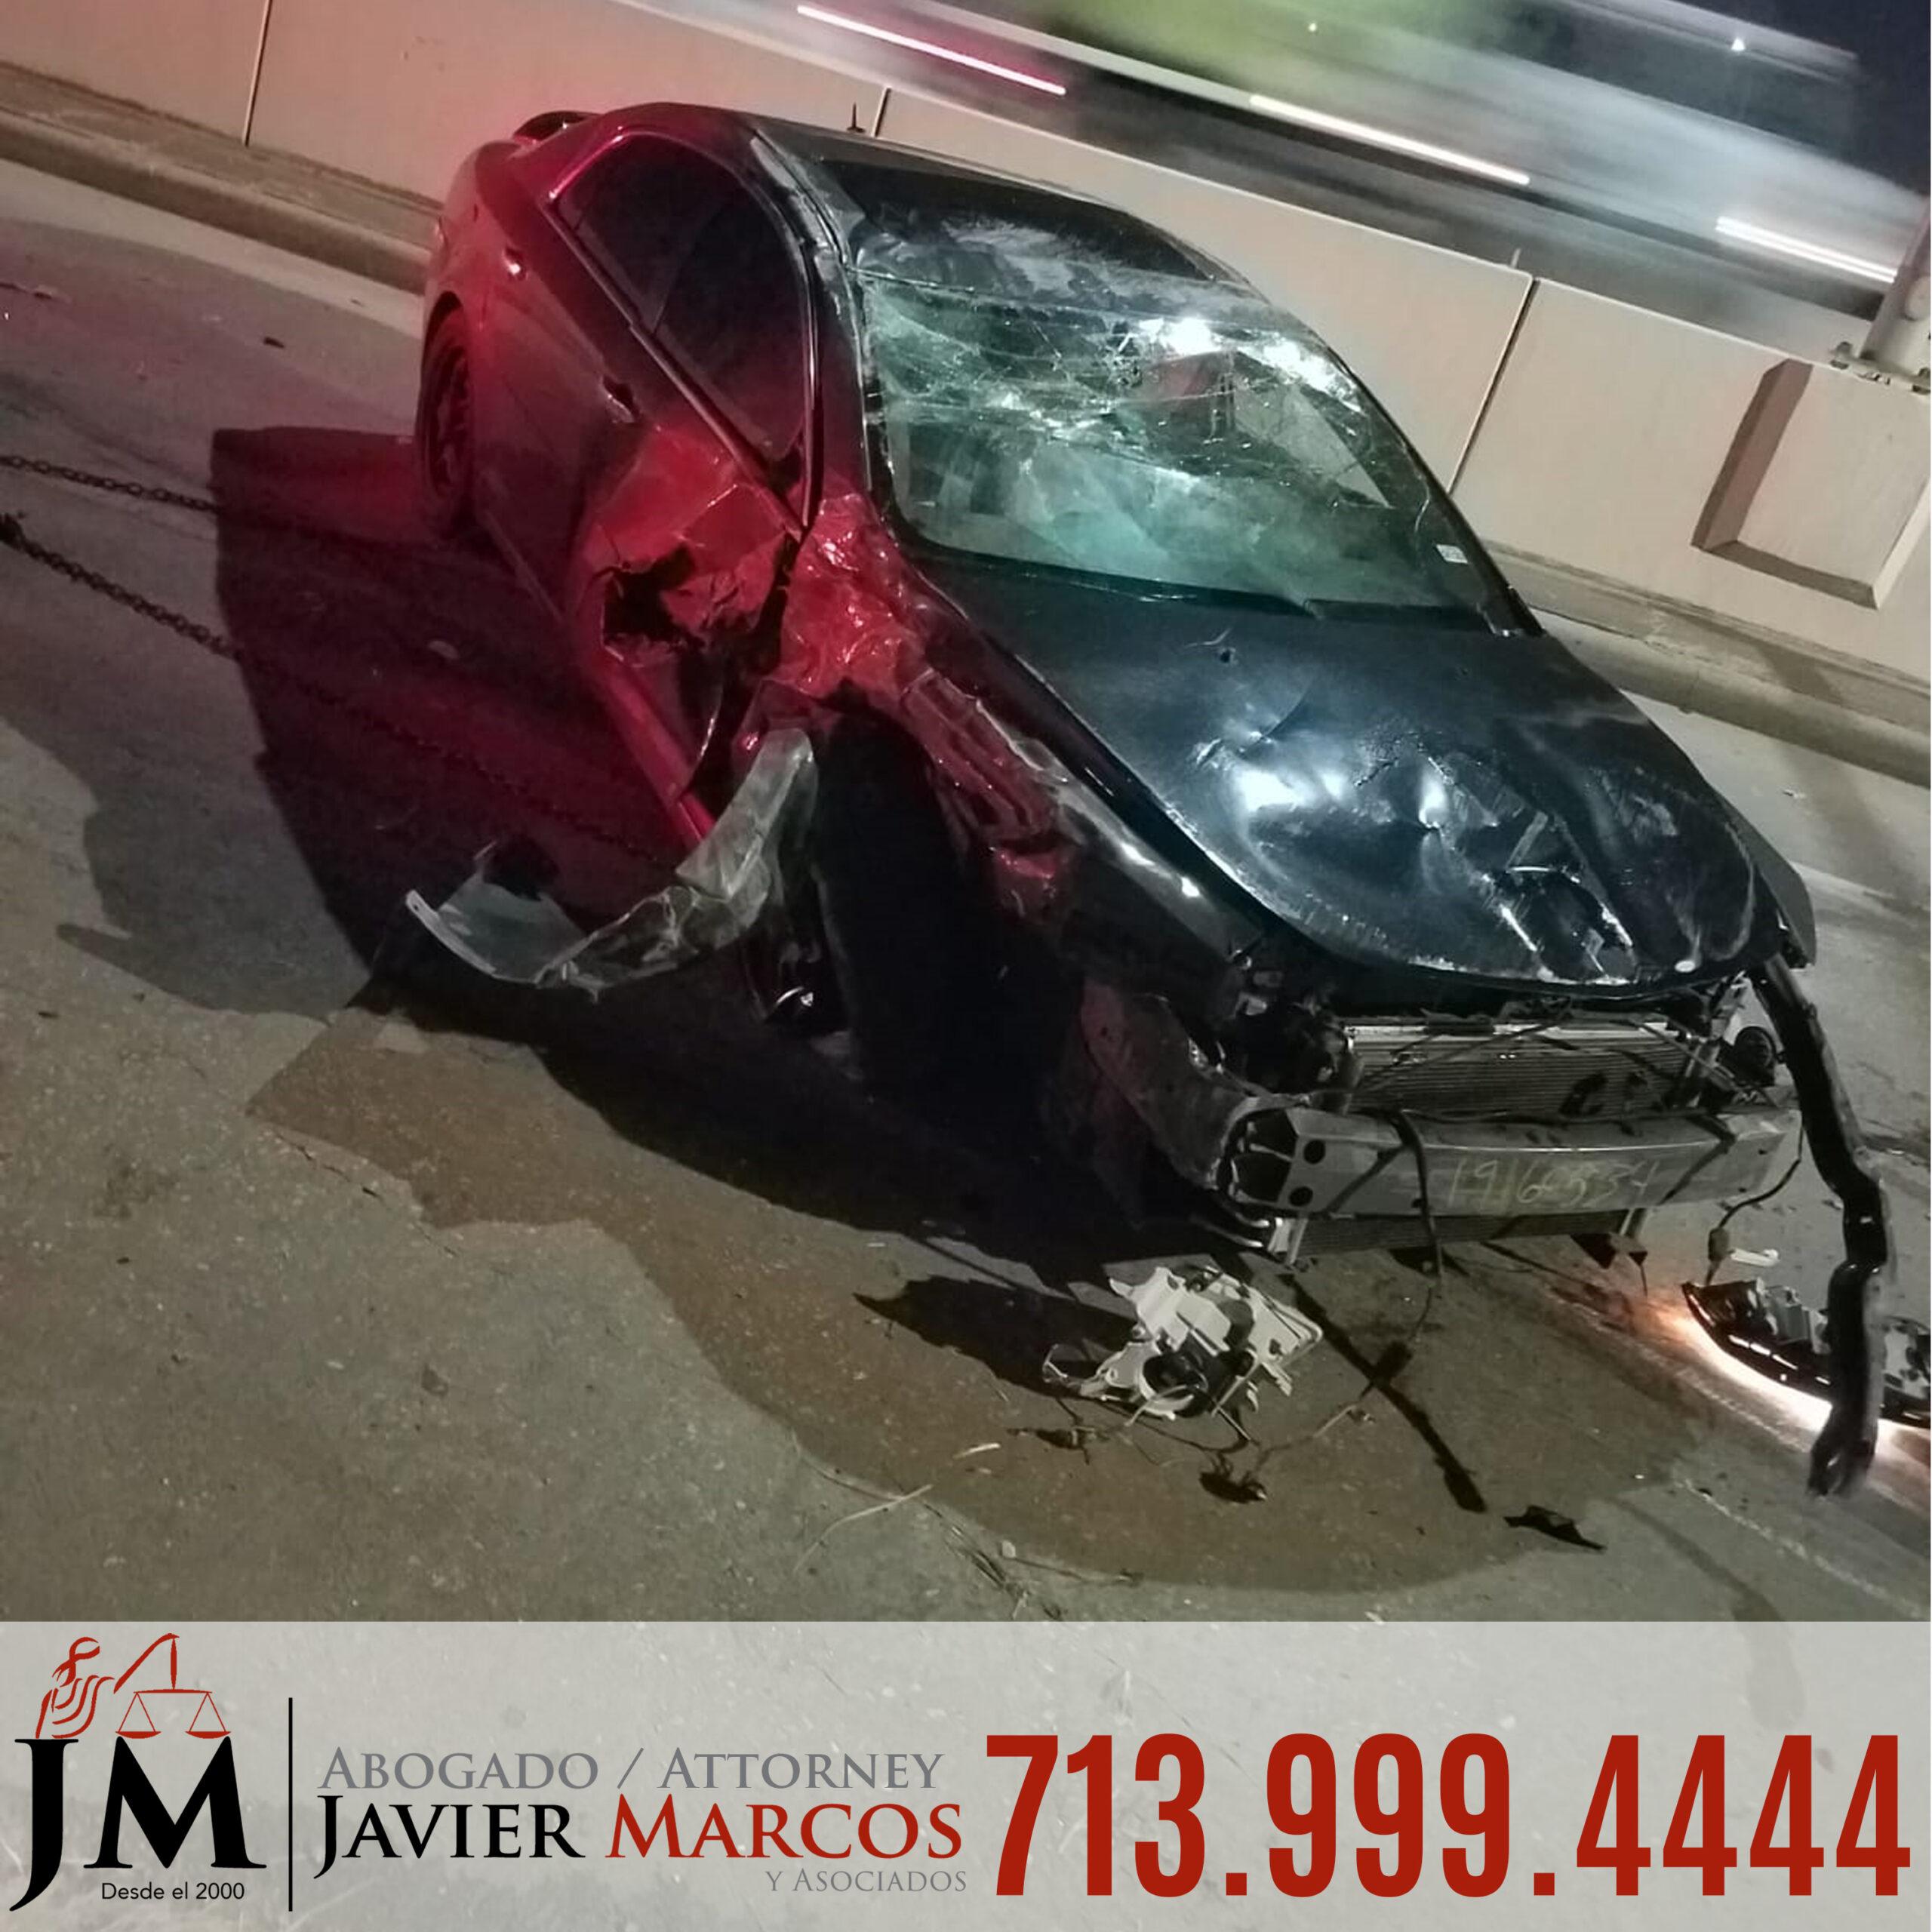 Abogado de Accidente de Coche | Abogado Javier Marcos | 713.999.4444